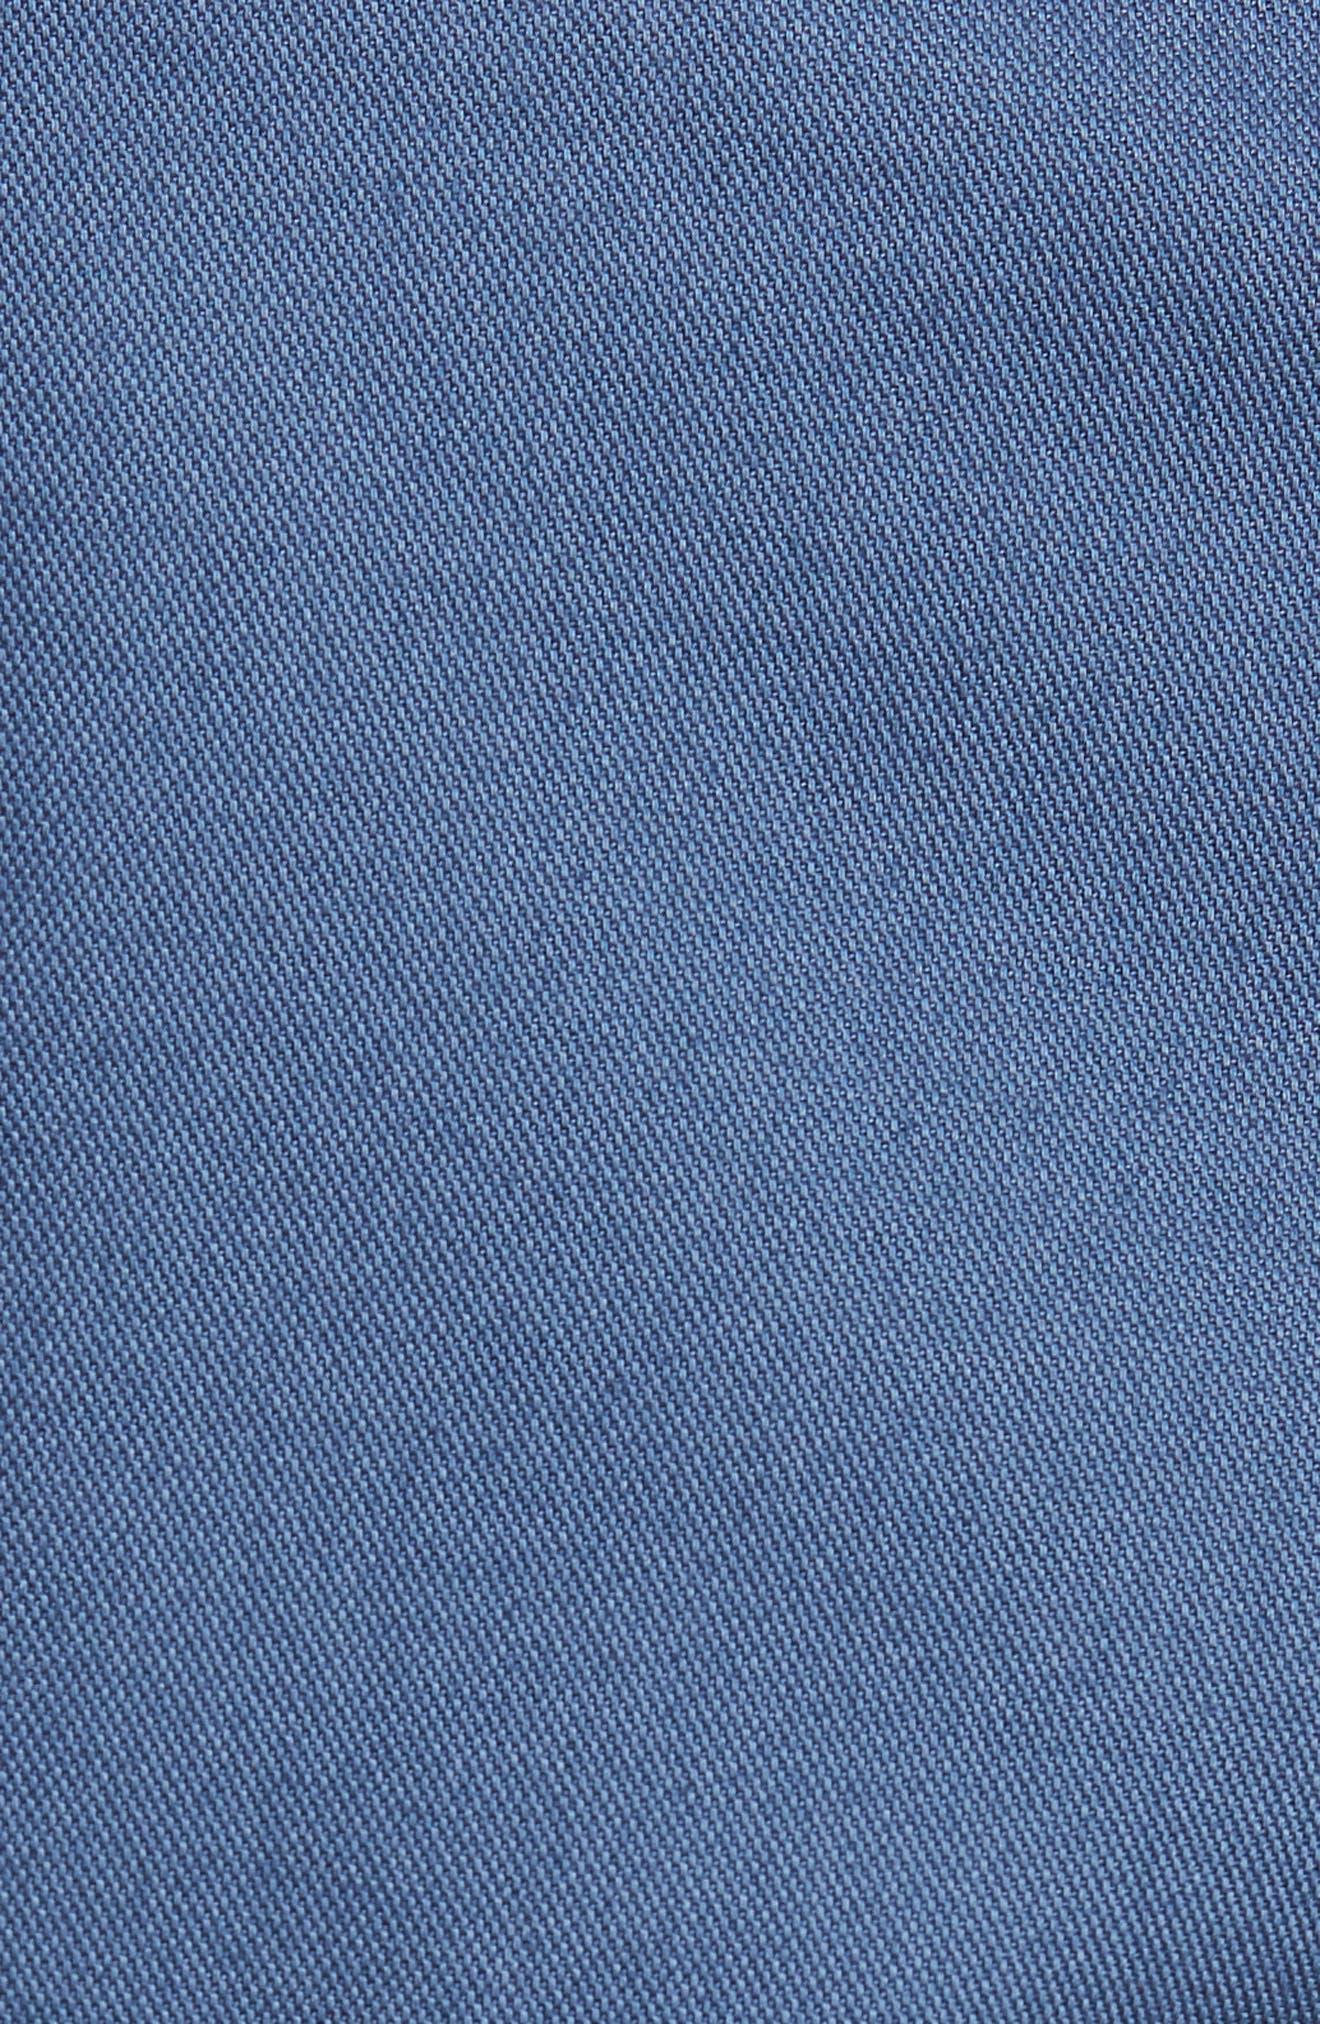 Driving Creek Regular Fit Flat Front Shorts,                             Alternate thumbnail 5, color,                             020